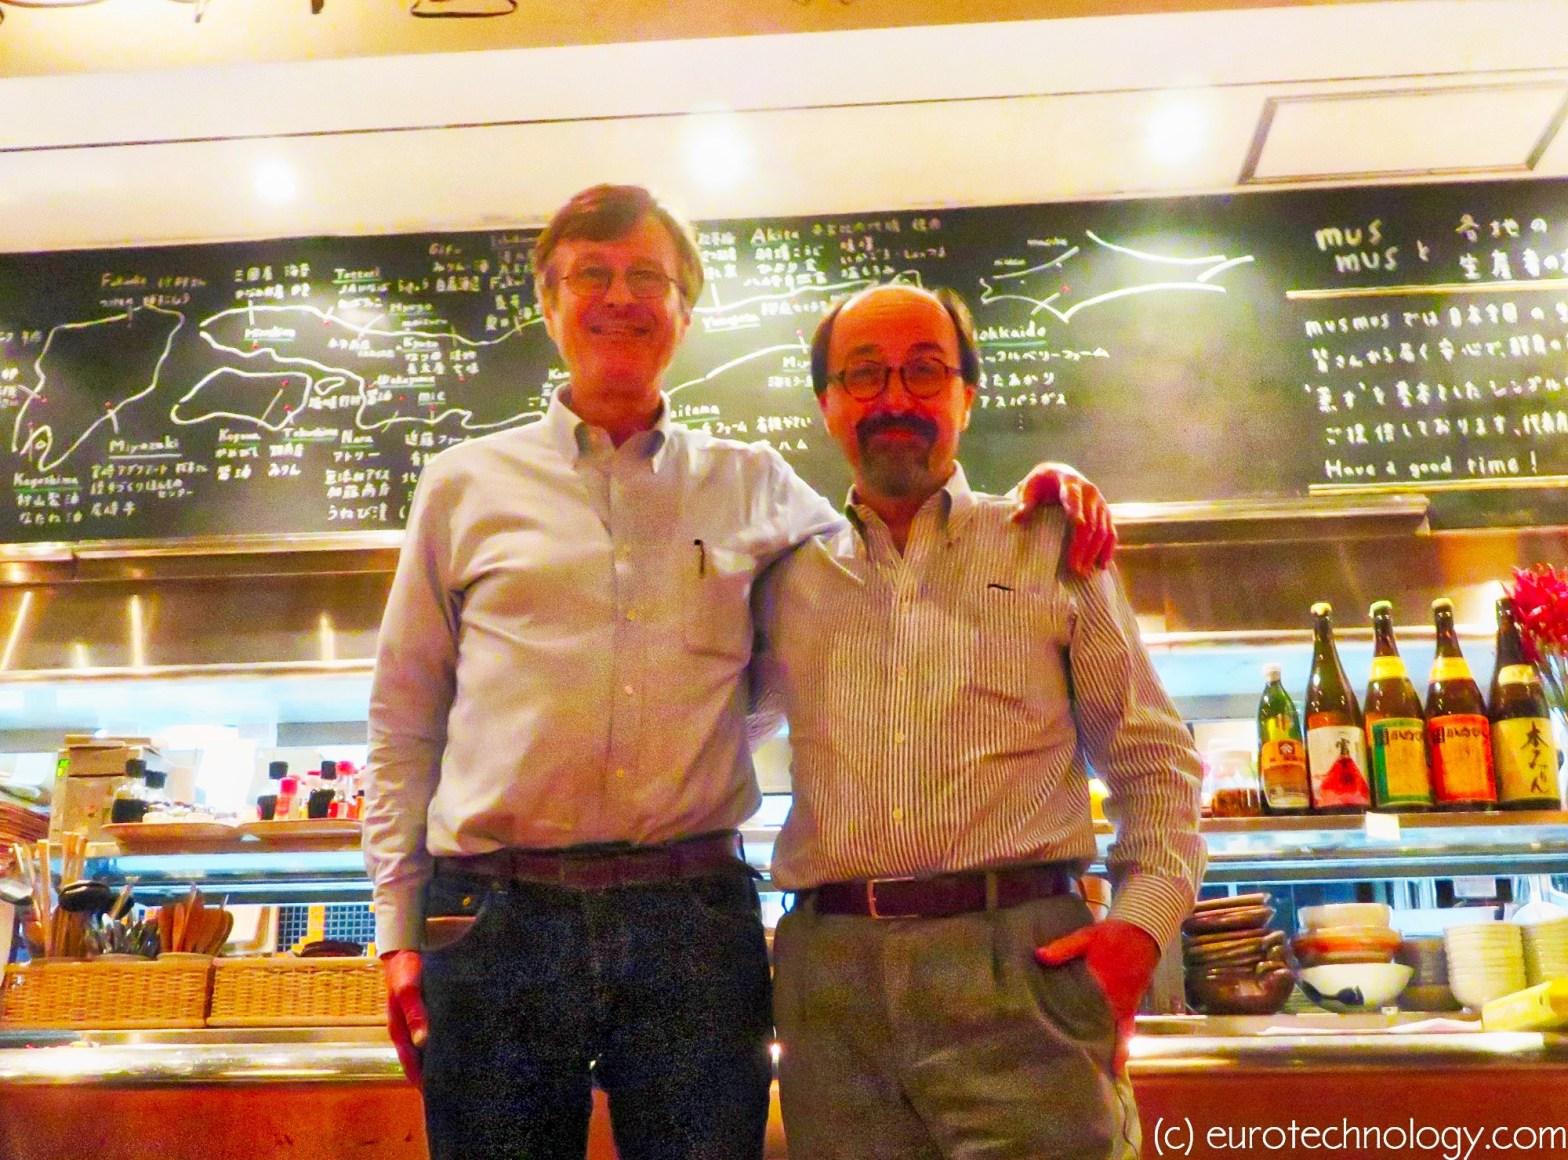 Women determine Japan's future - Bill Emmott and Gerhard Fasol discuss Japan's future